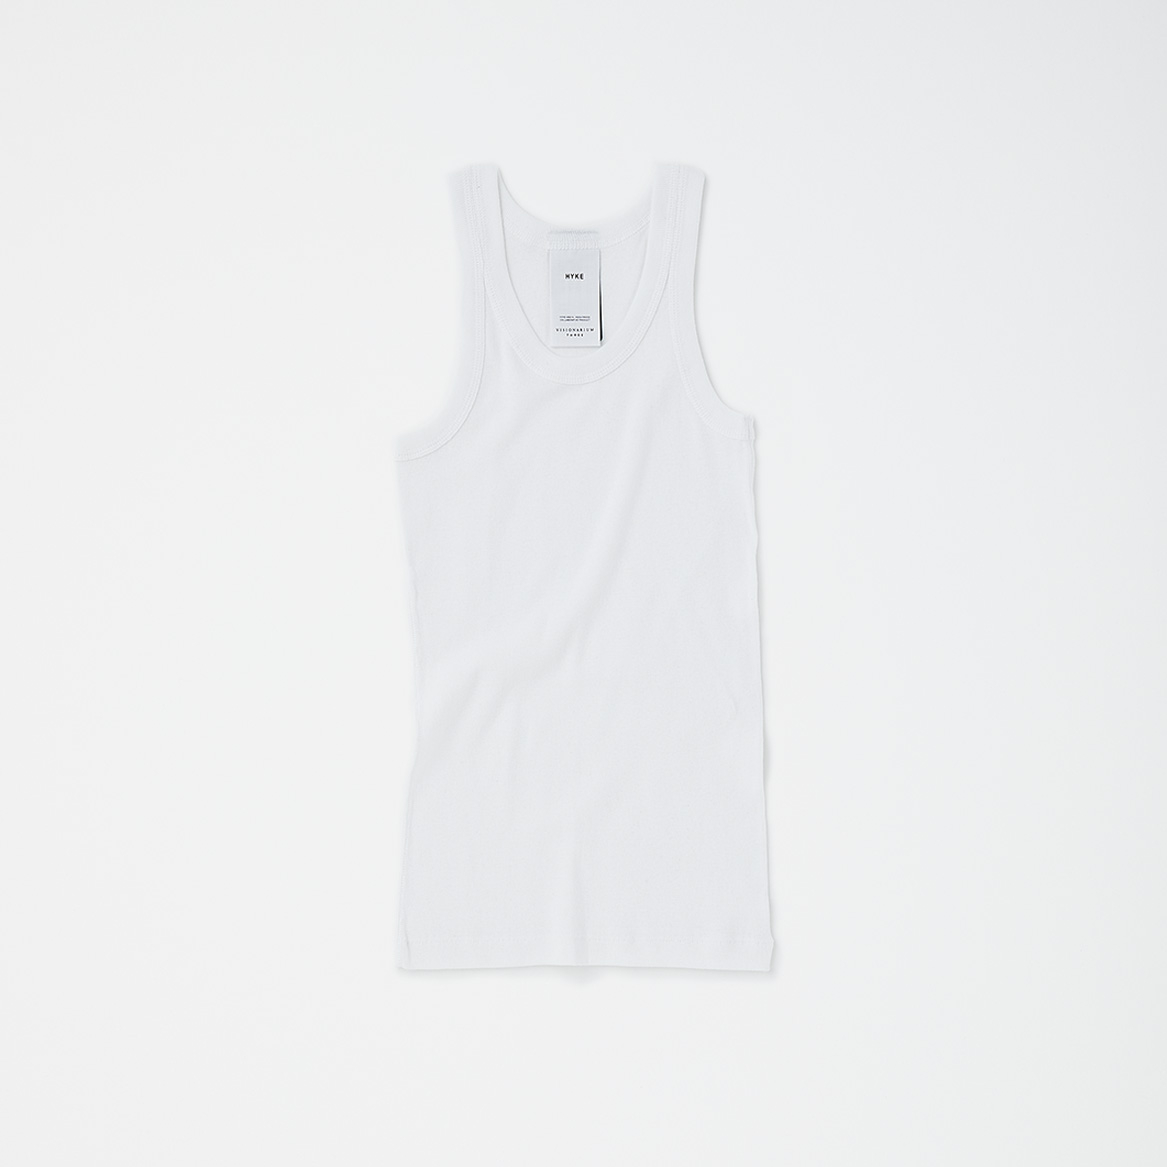 HYKE TANK TOP PACKAGE WHITE ¥8,700(セット内容:HYKE TANK TOP、STUFF BAG WHITE、THREE ソーラーティンティドグローフロー サシェ×7包、THREE バランシング クレンジング オイル R ミニボトル 5ml×1本/今夏発売予定)